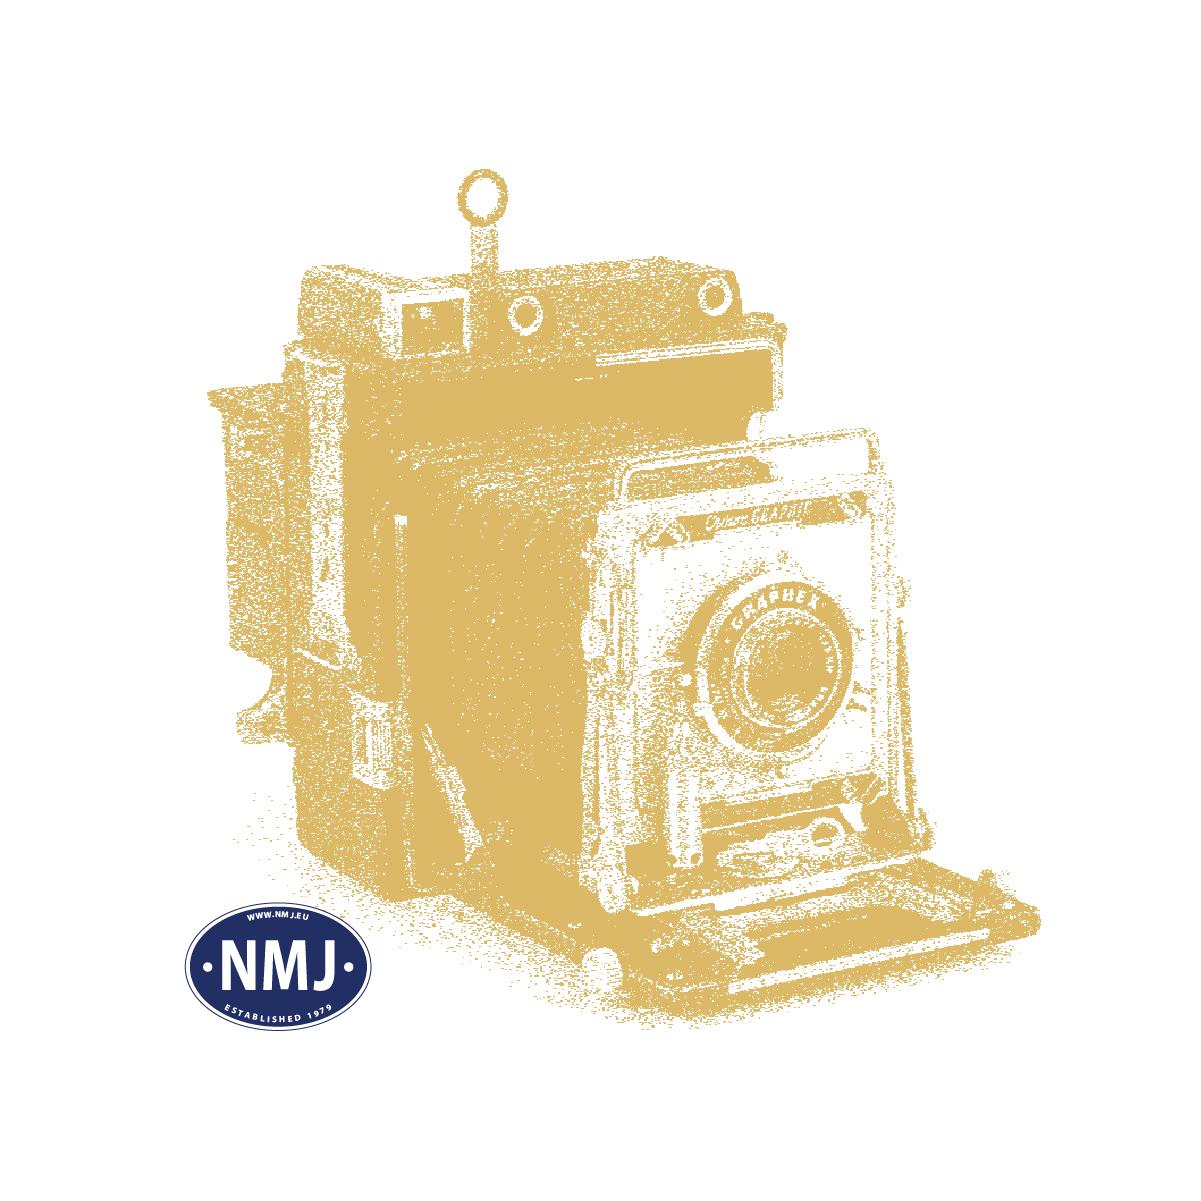 FLM640000 - Universal Pensemotor, Fleischmann Profigleis, H0/N-Skala